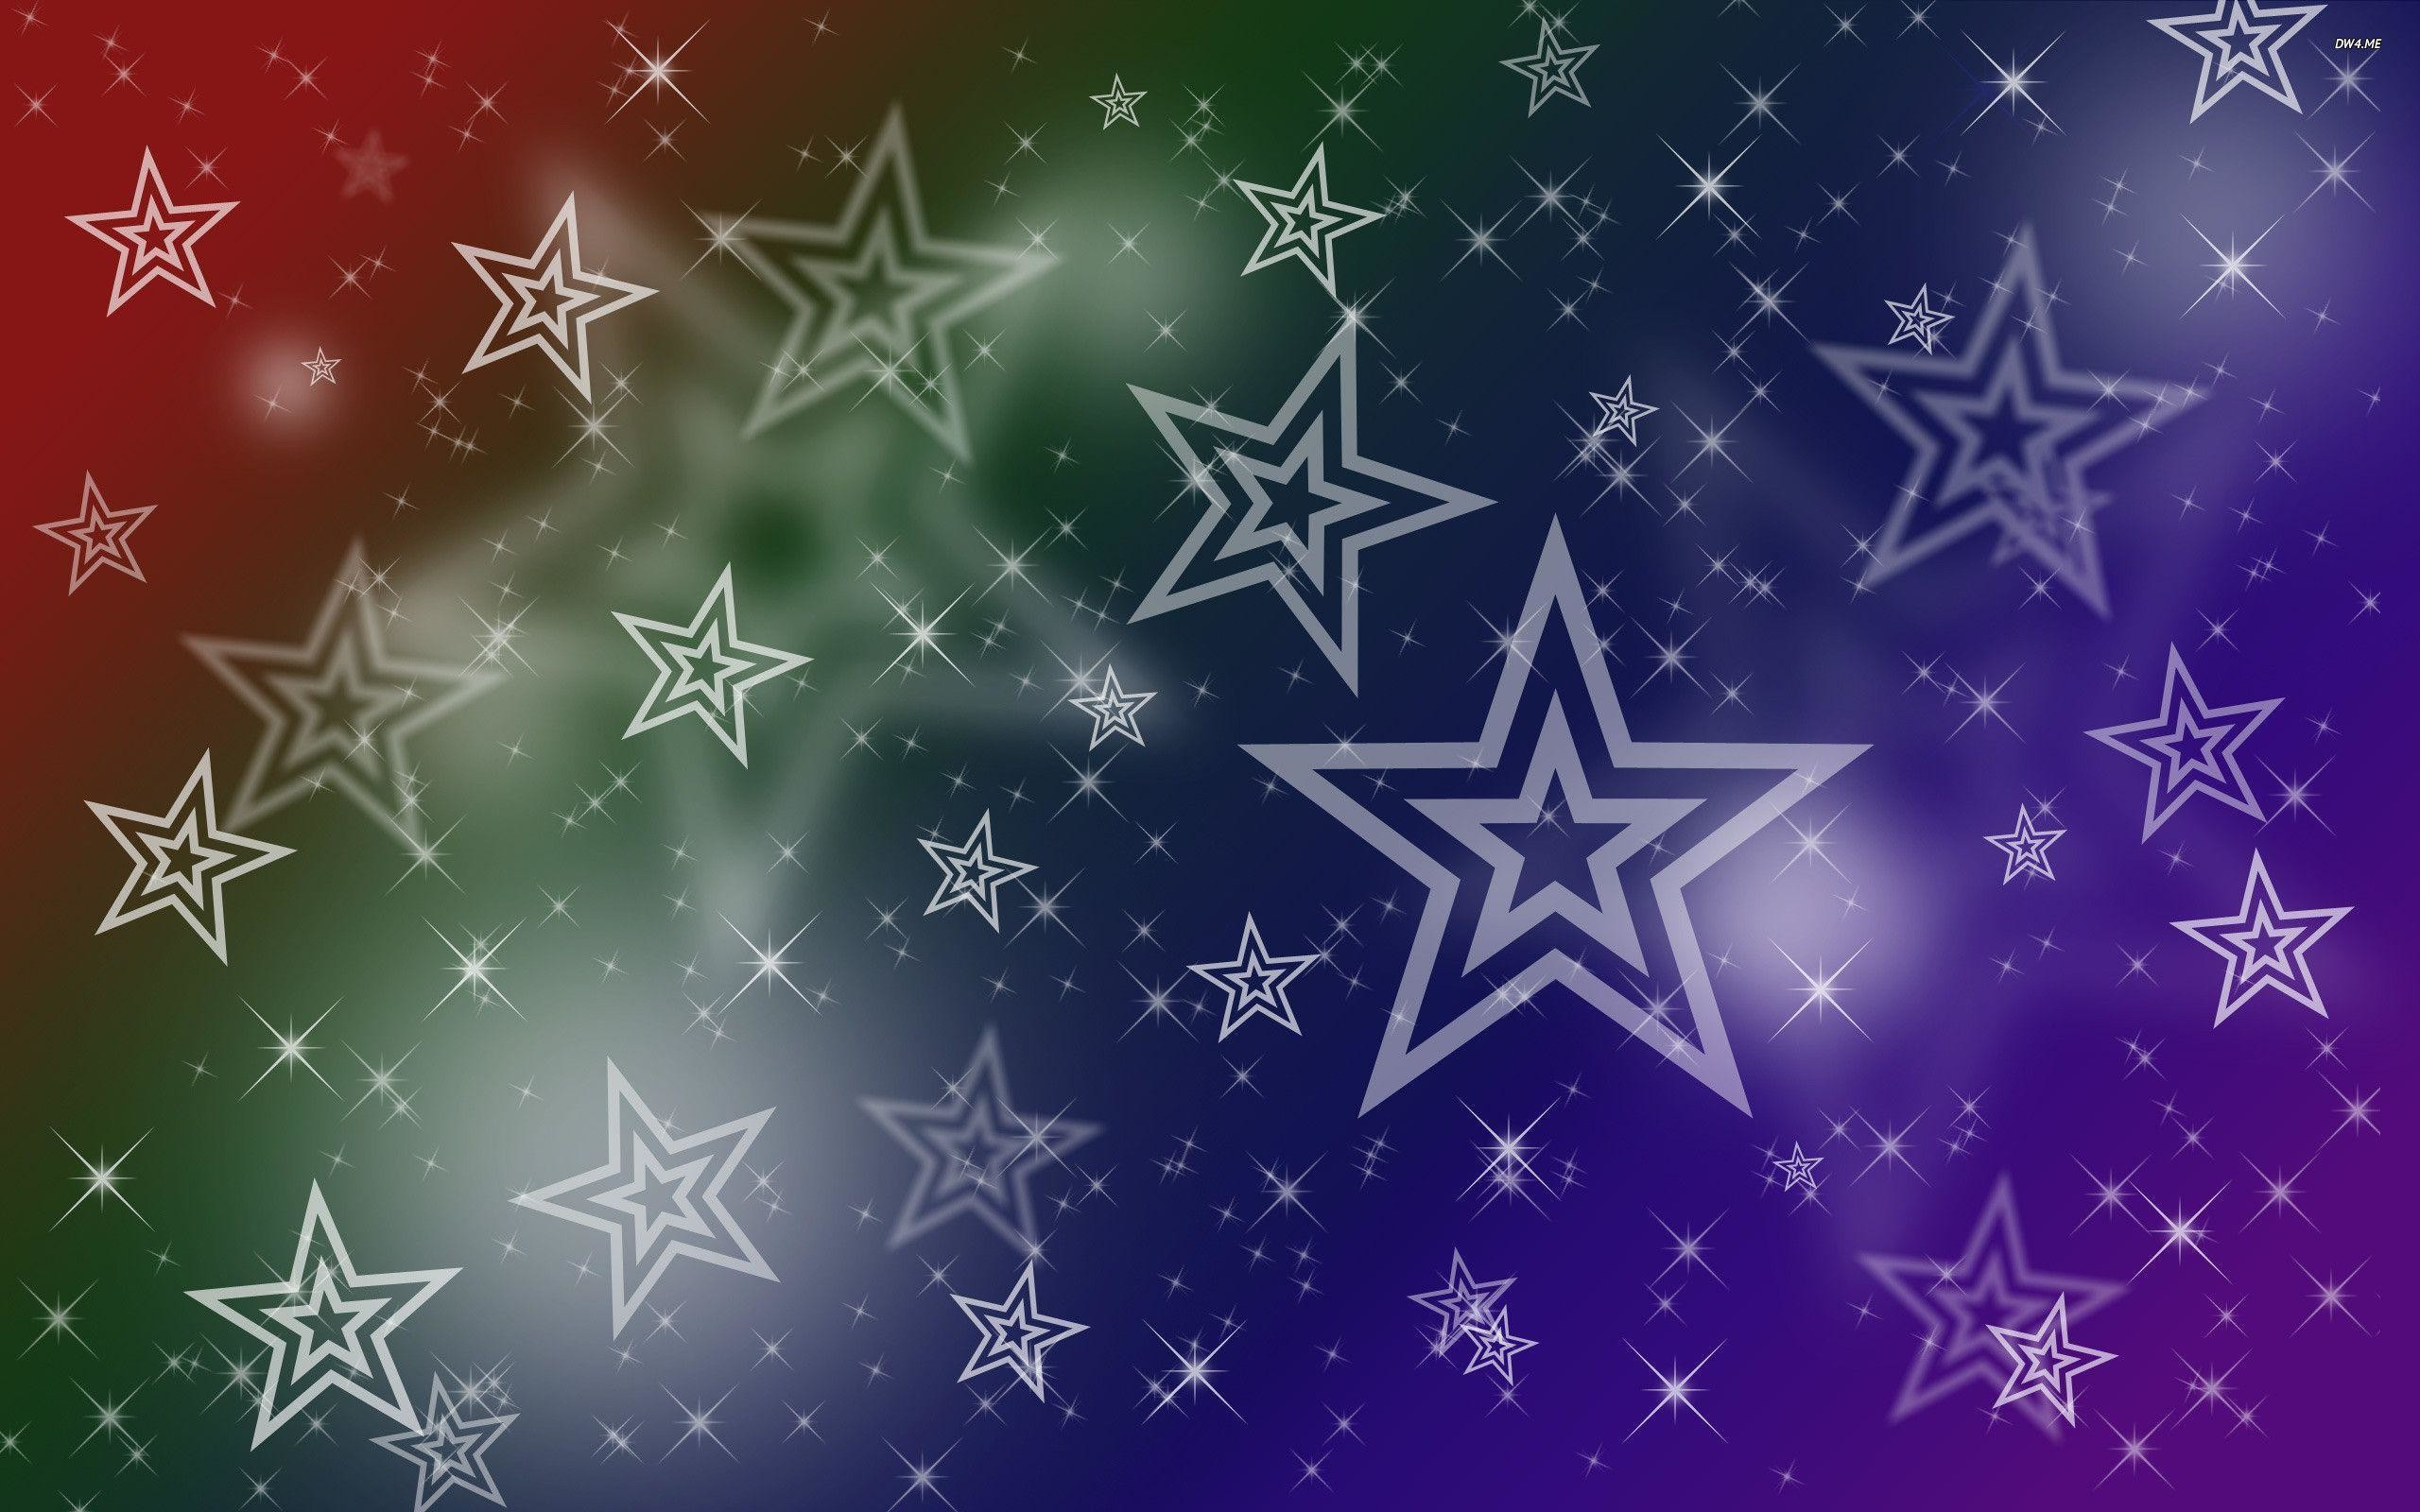 Wallpapers For > Shining Star Wallpaper